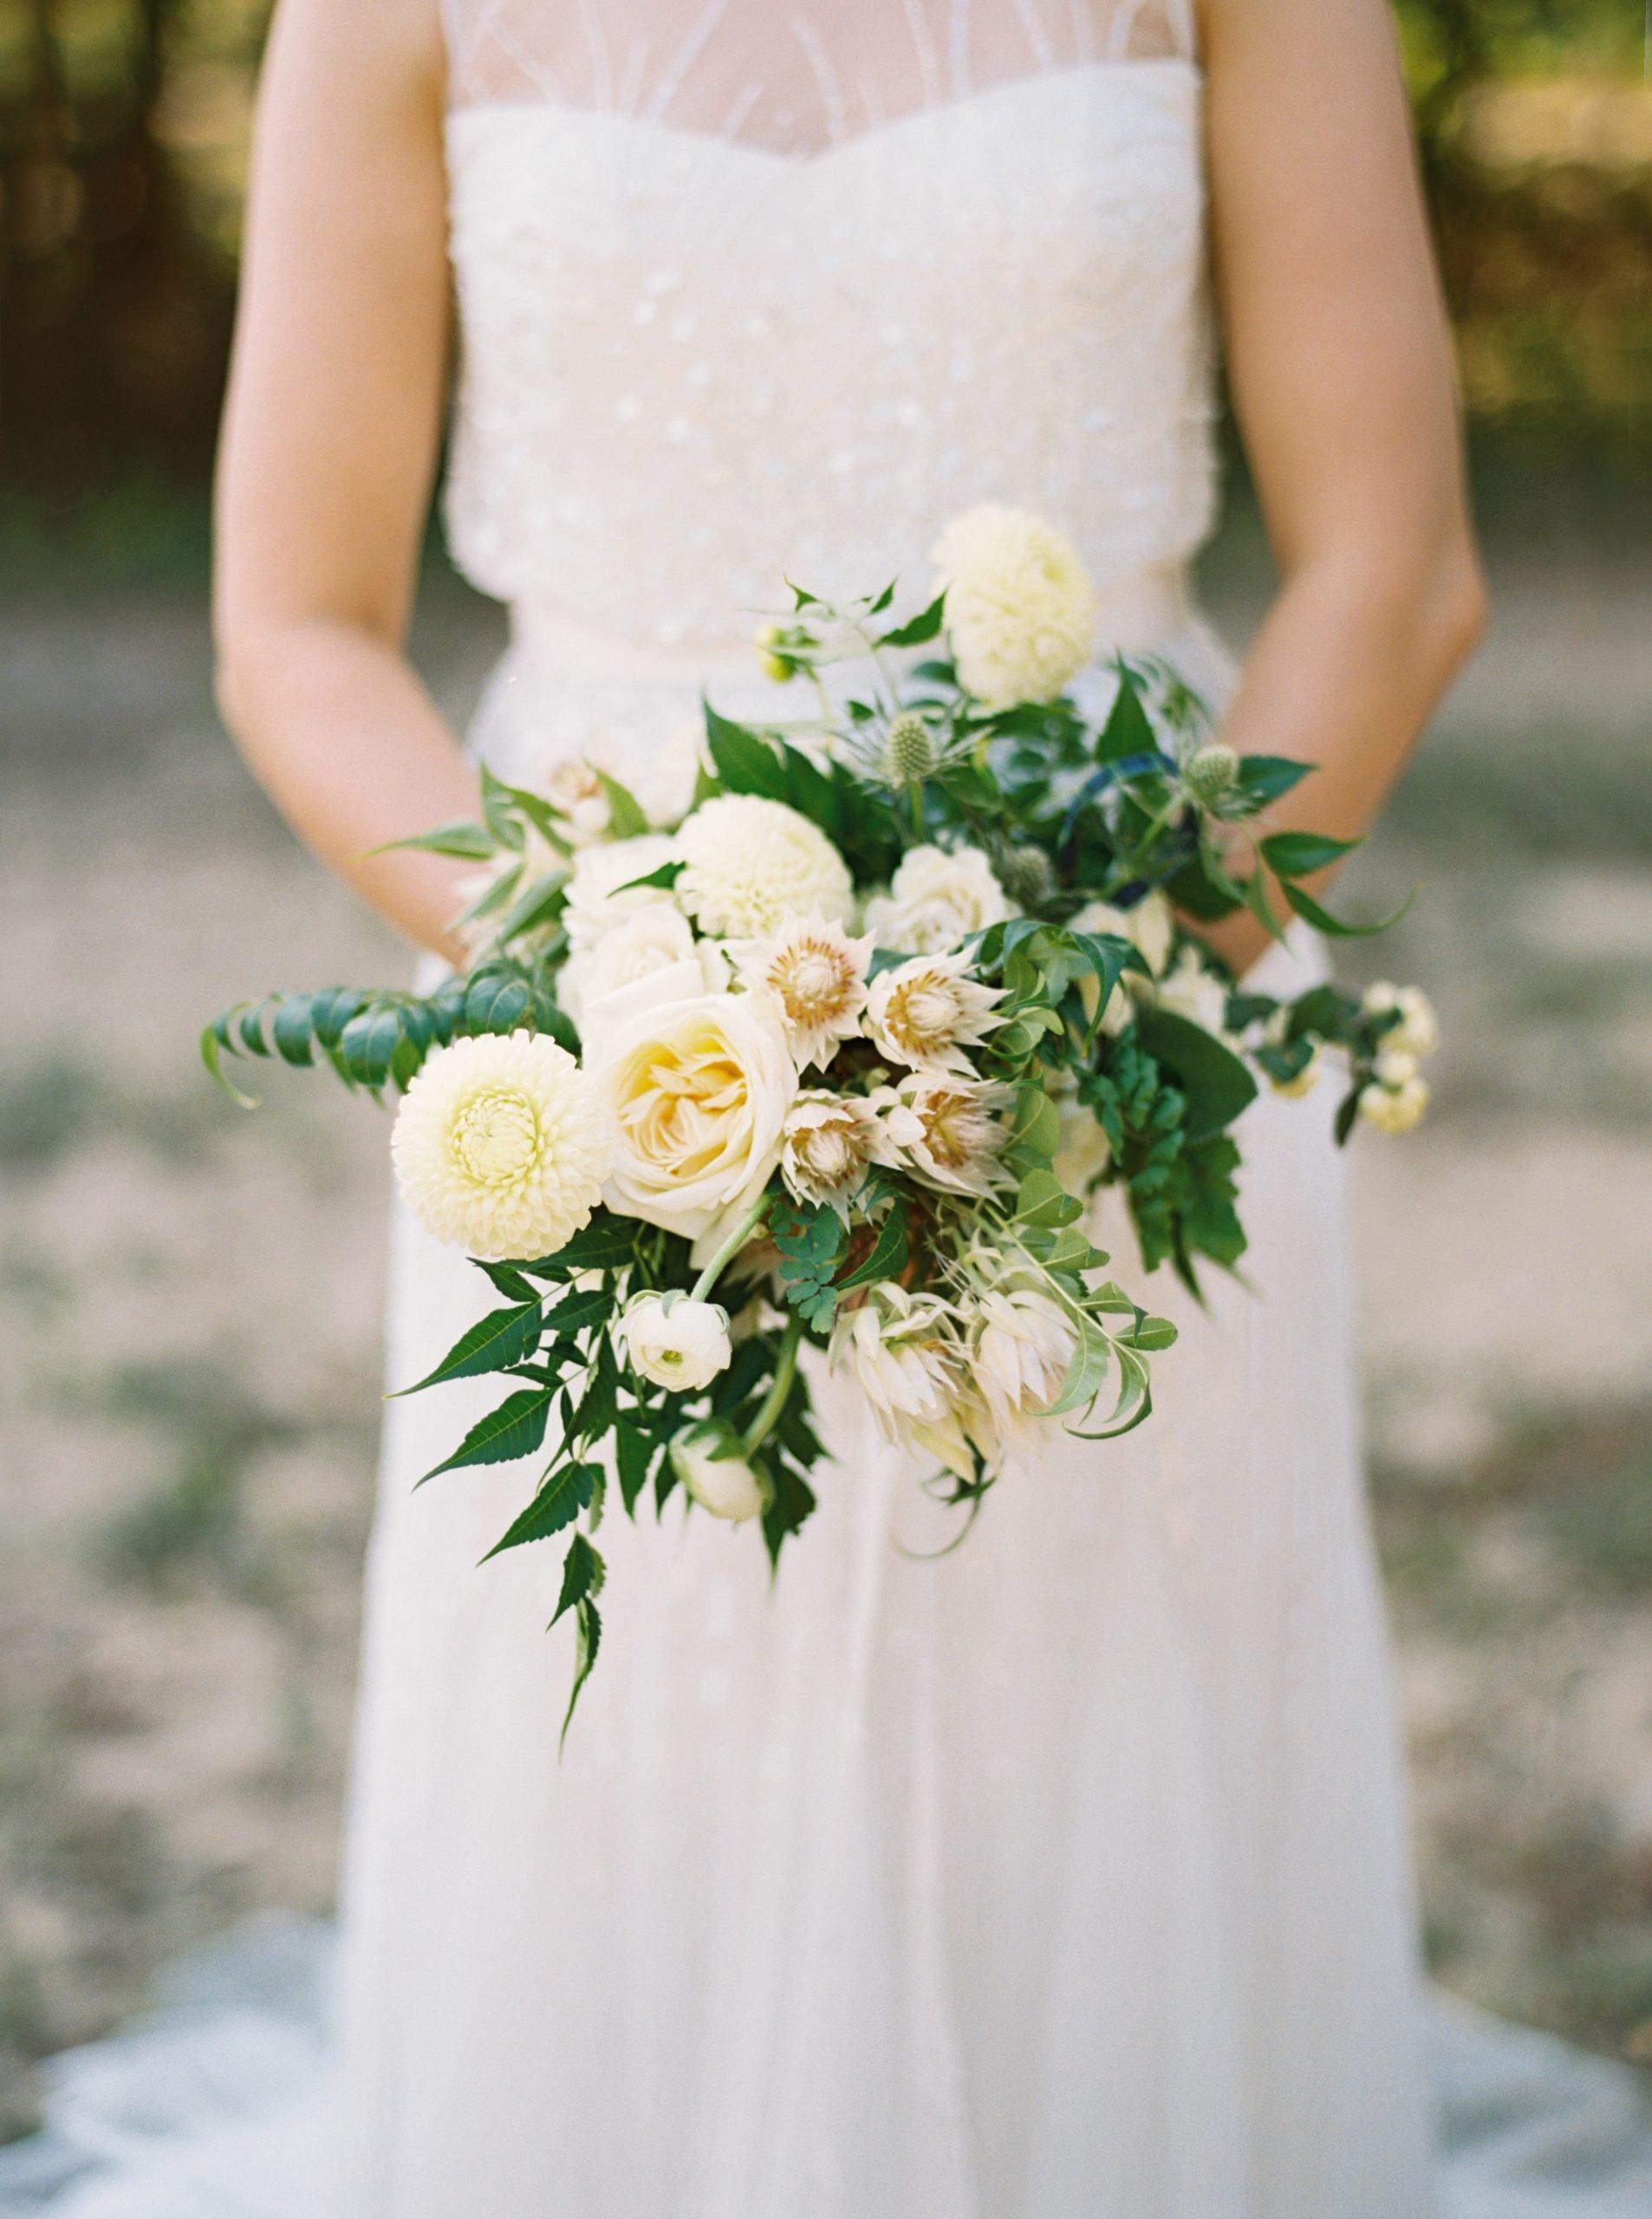 Collie Wedding - Apryl Ann Photography - Bridal Bouquet